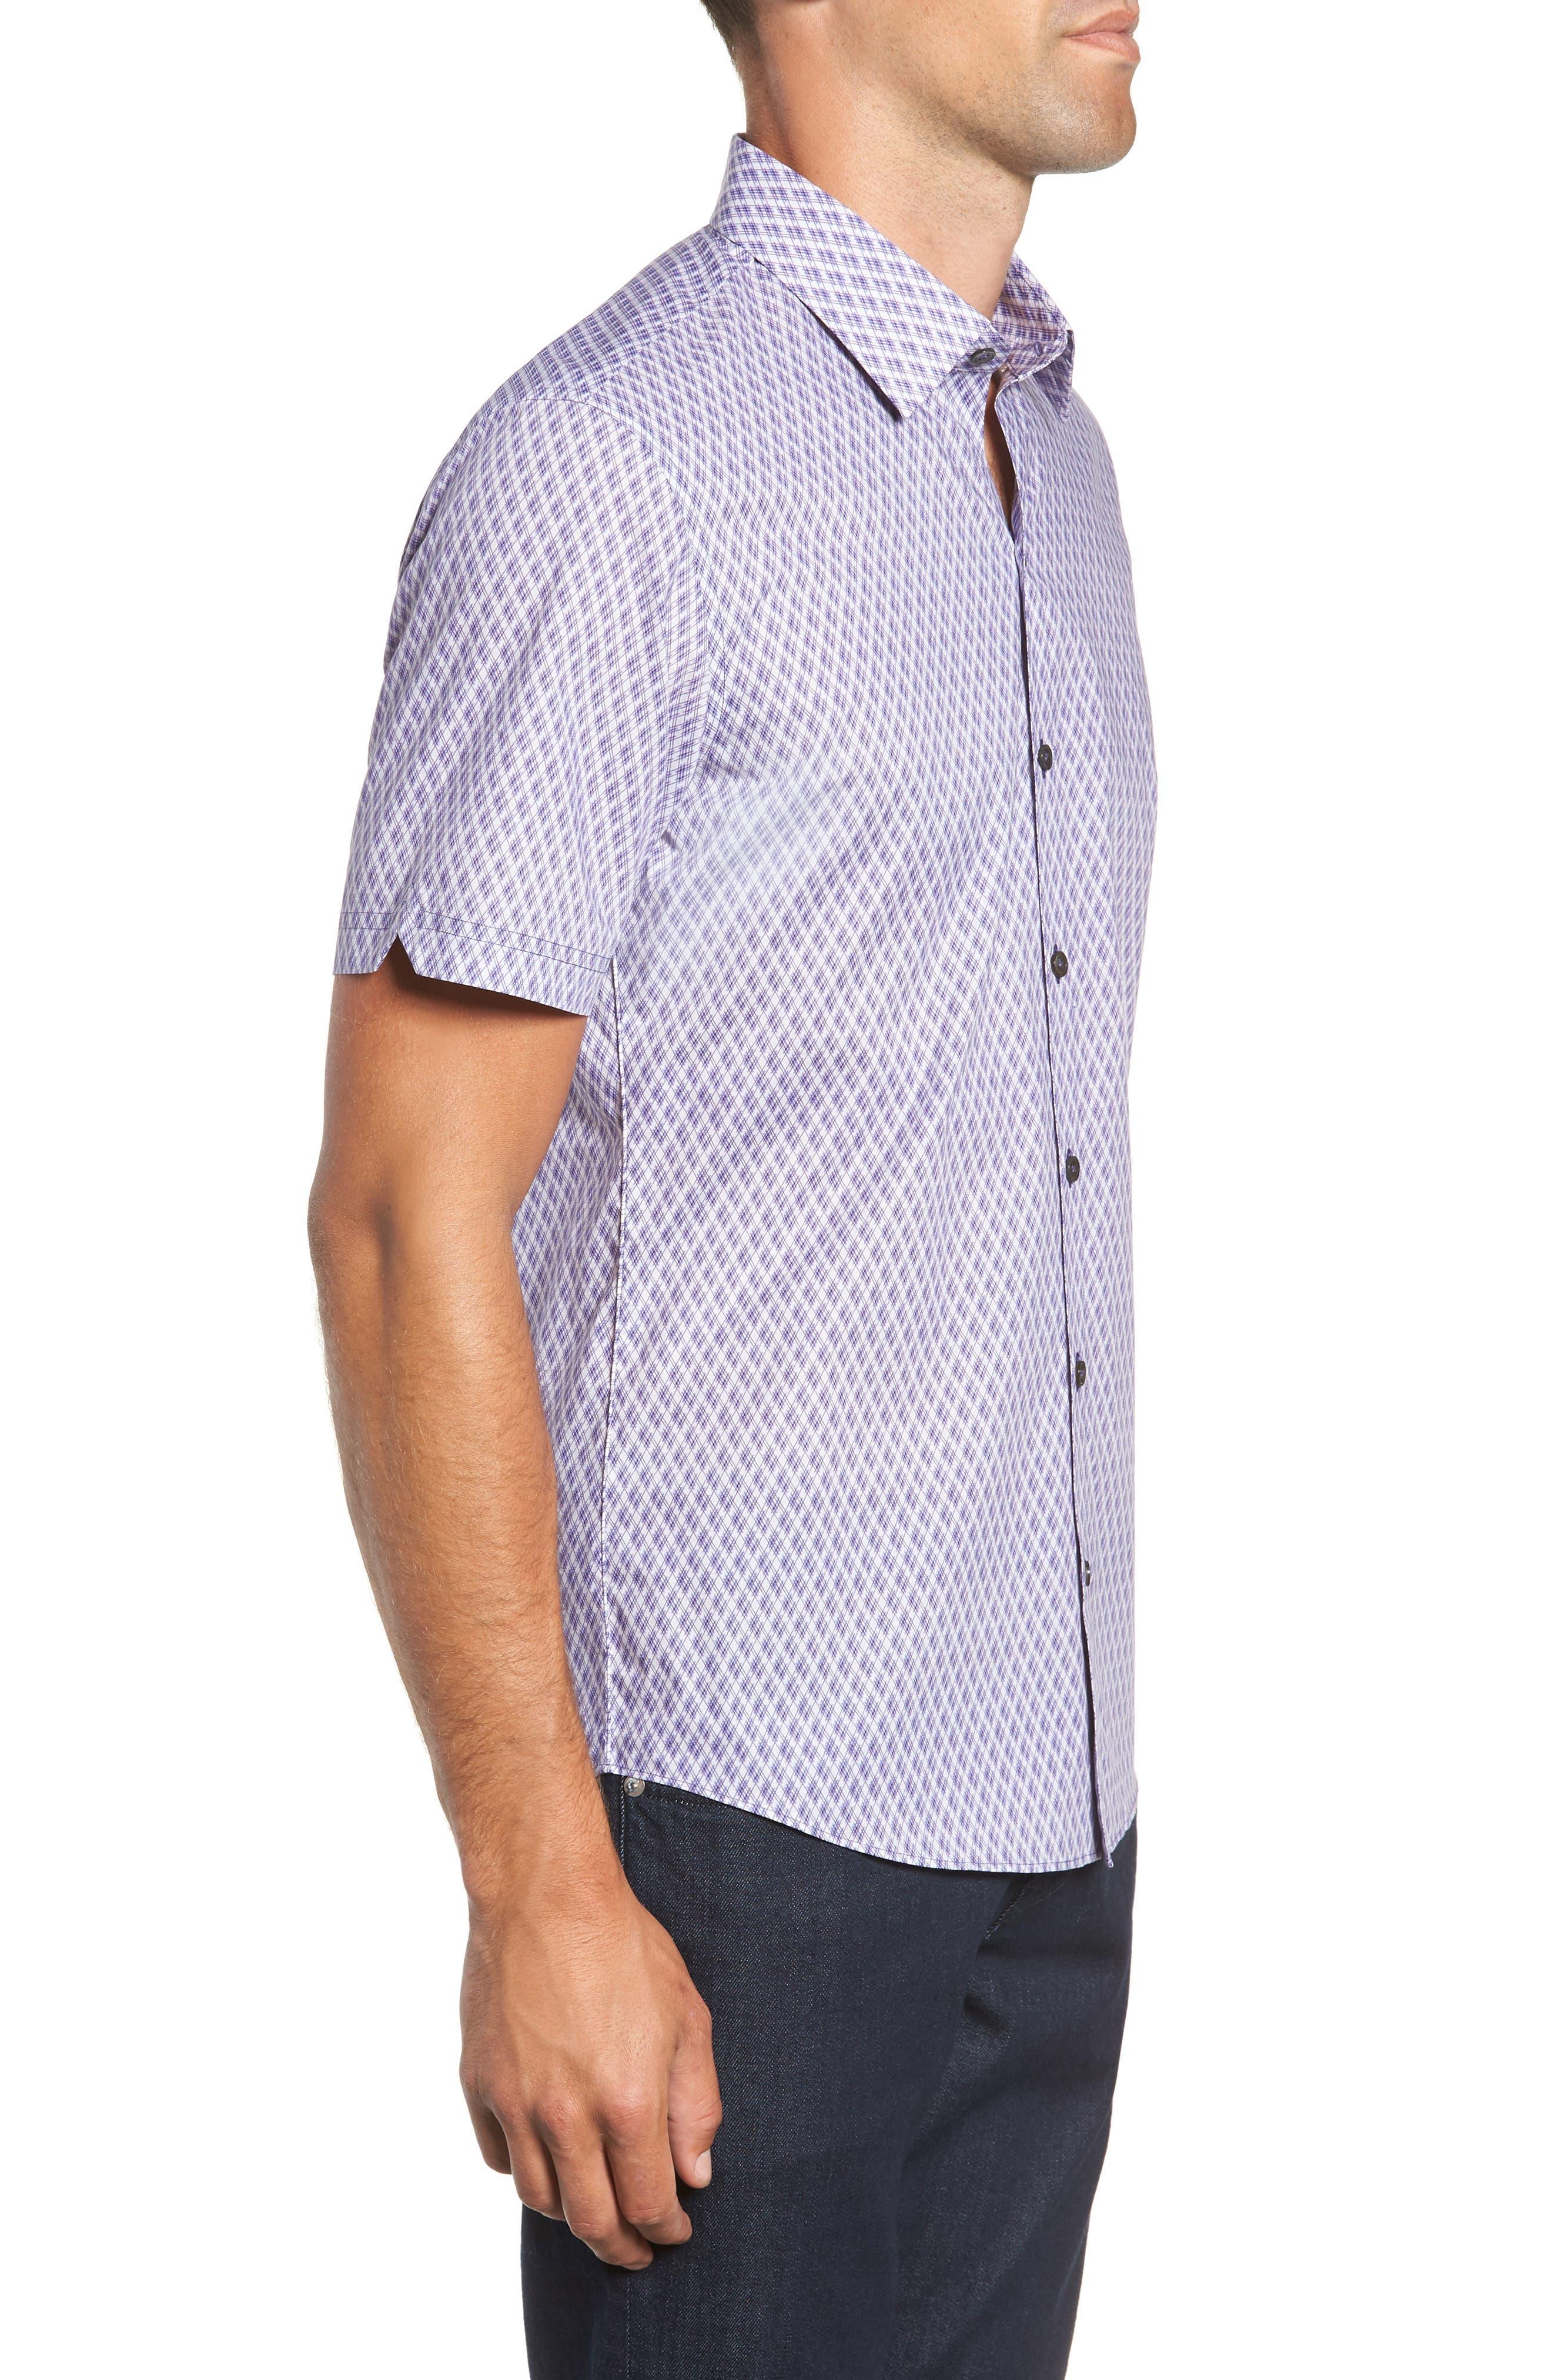 Madorin Regular Fit Sport Shirt,                             Alternate thumbnail 4, color,                             PURPLE